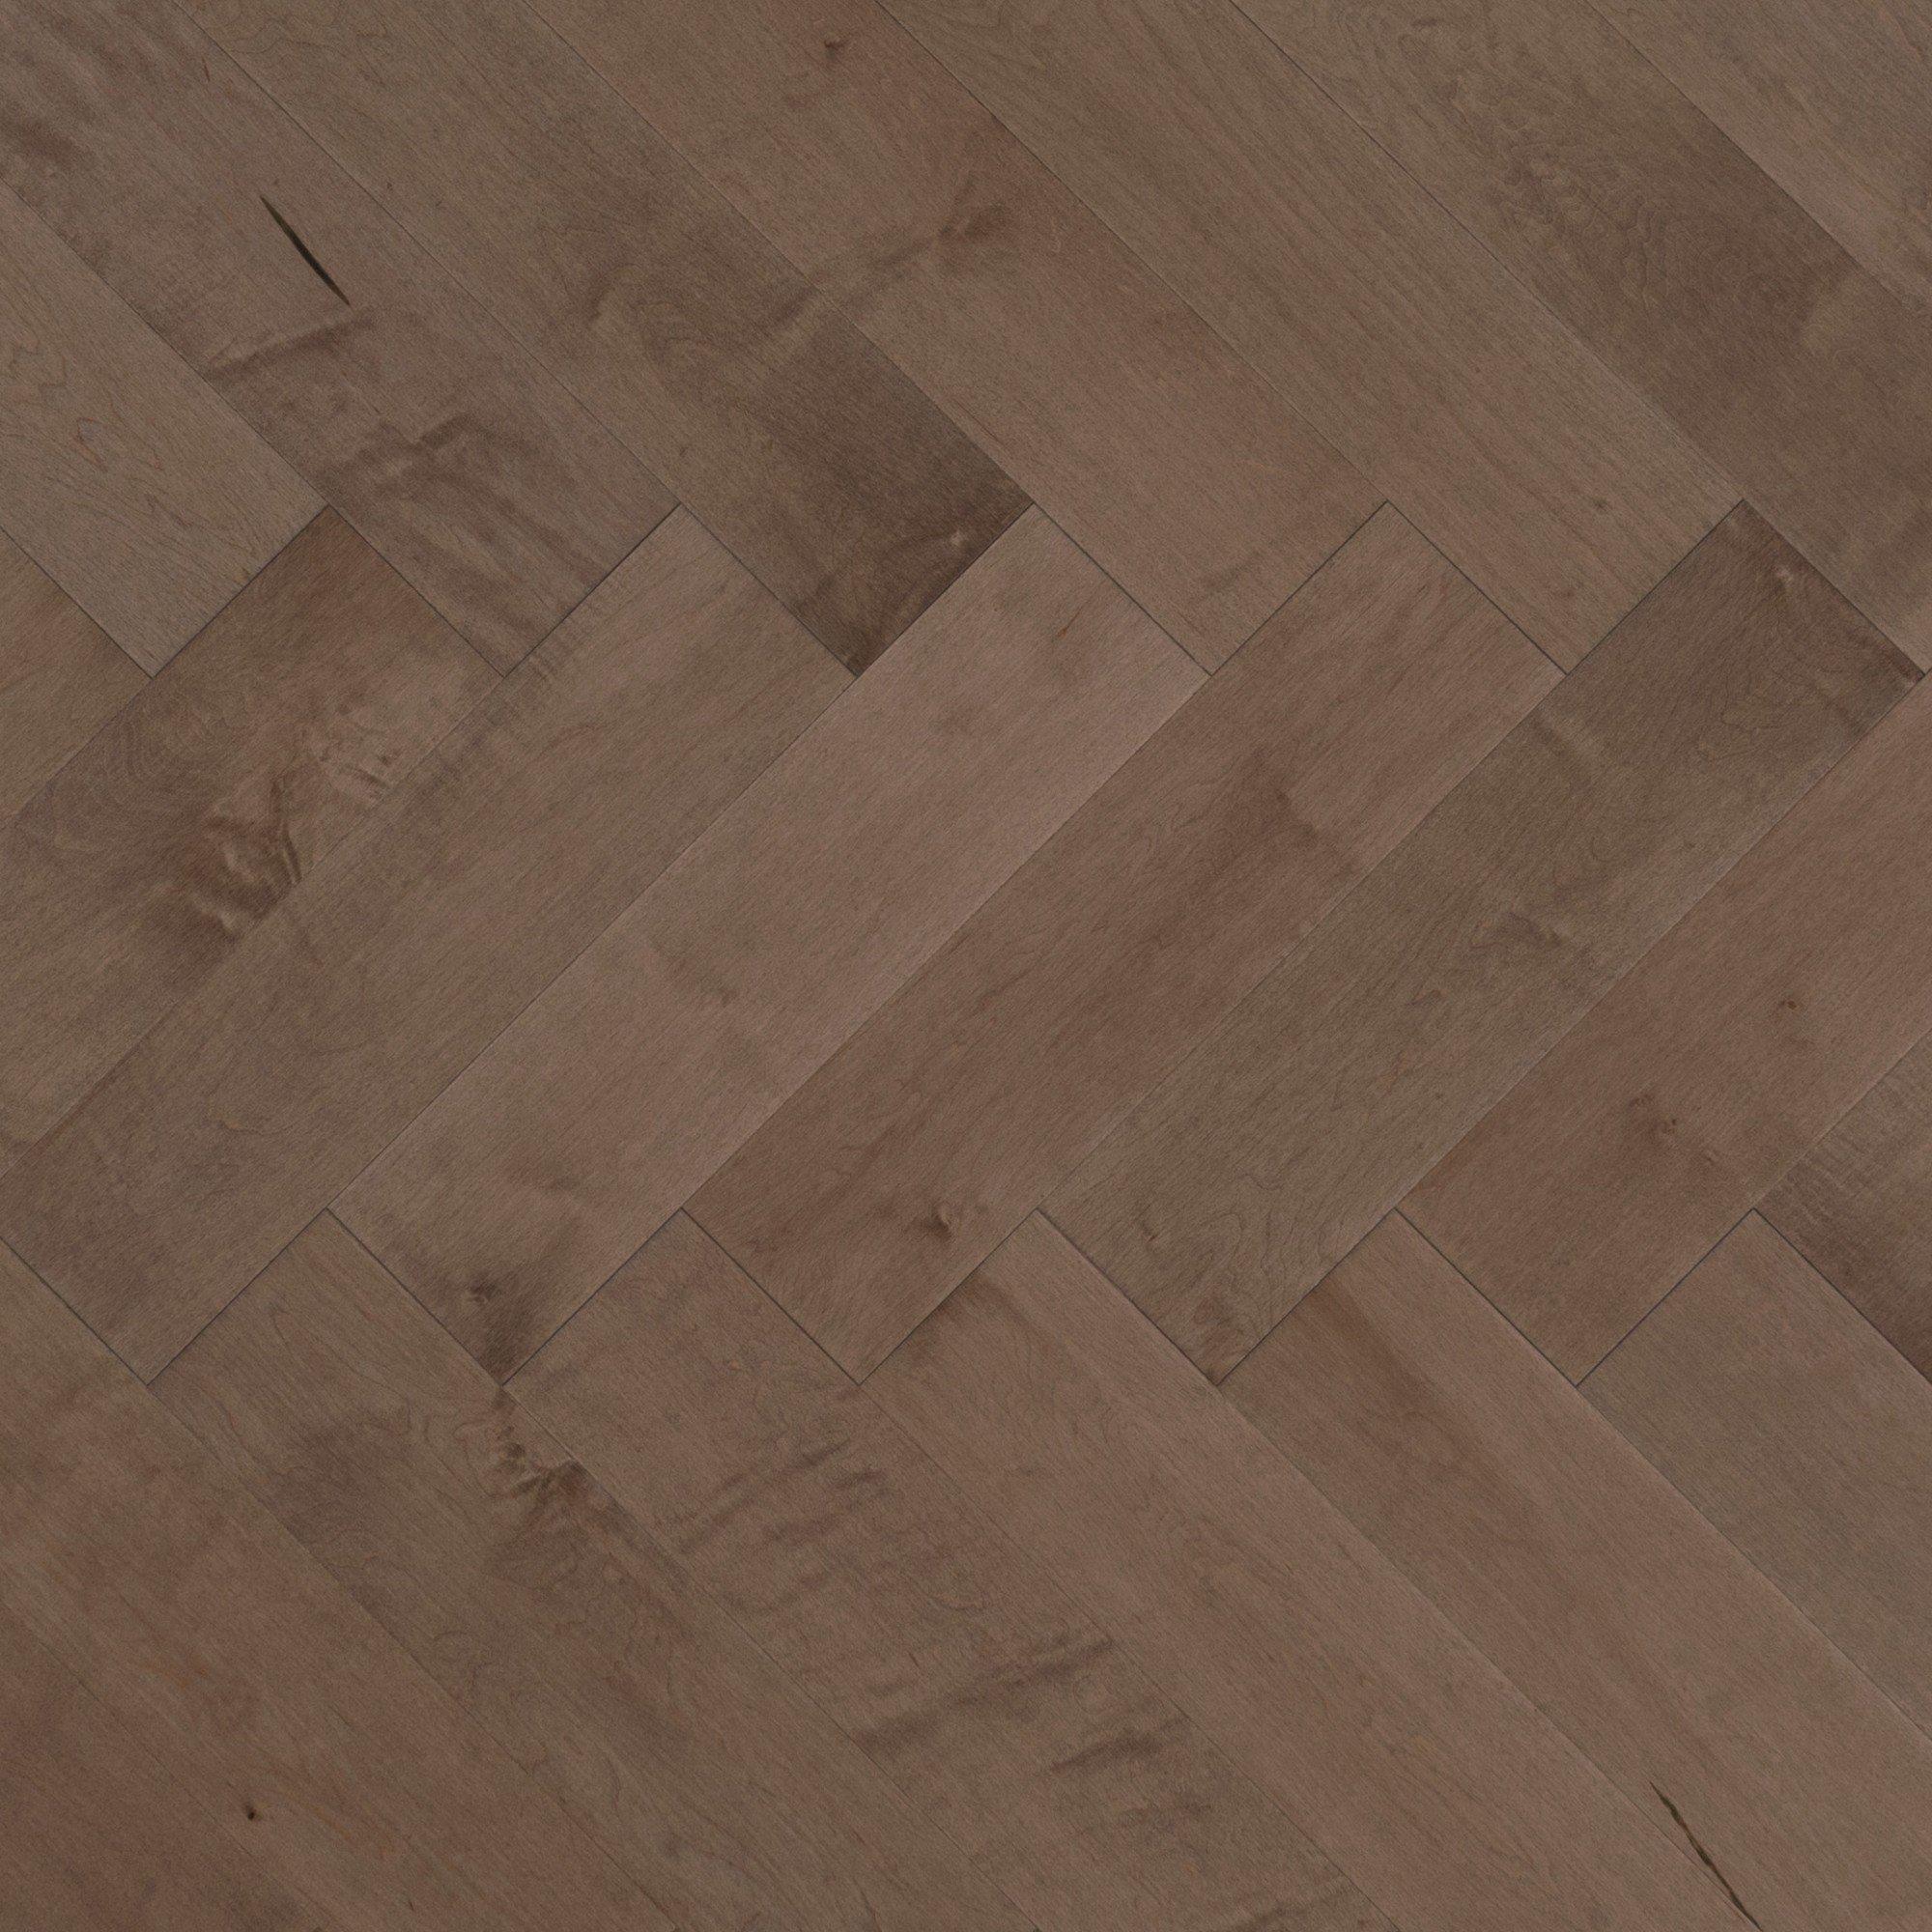 Maple Greystone Exclusive Smooth - Floor image